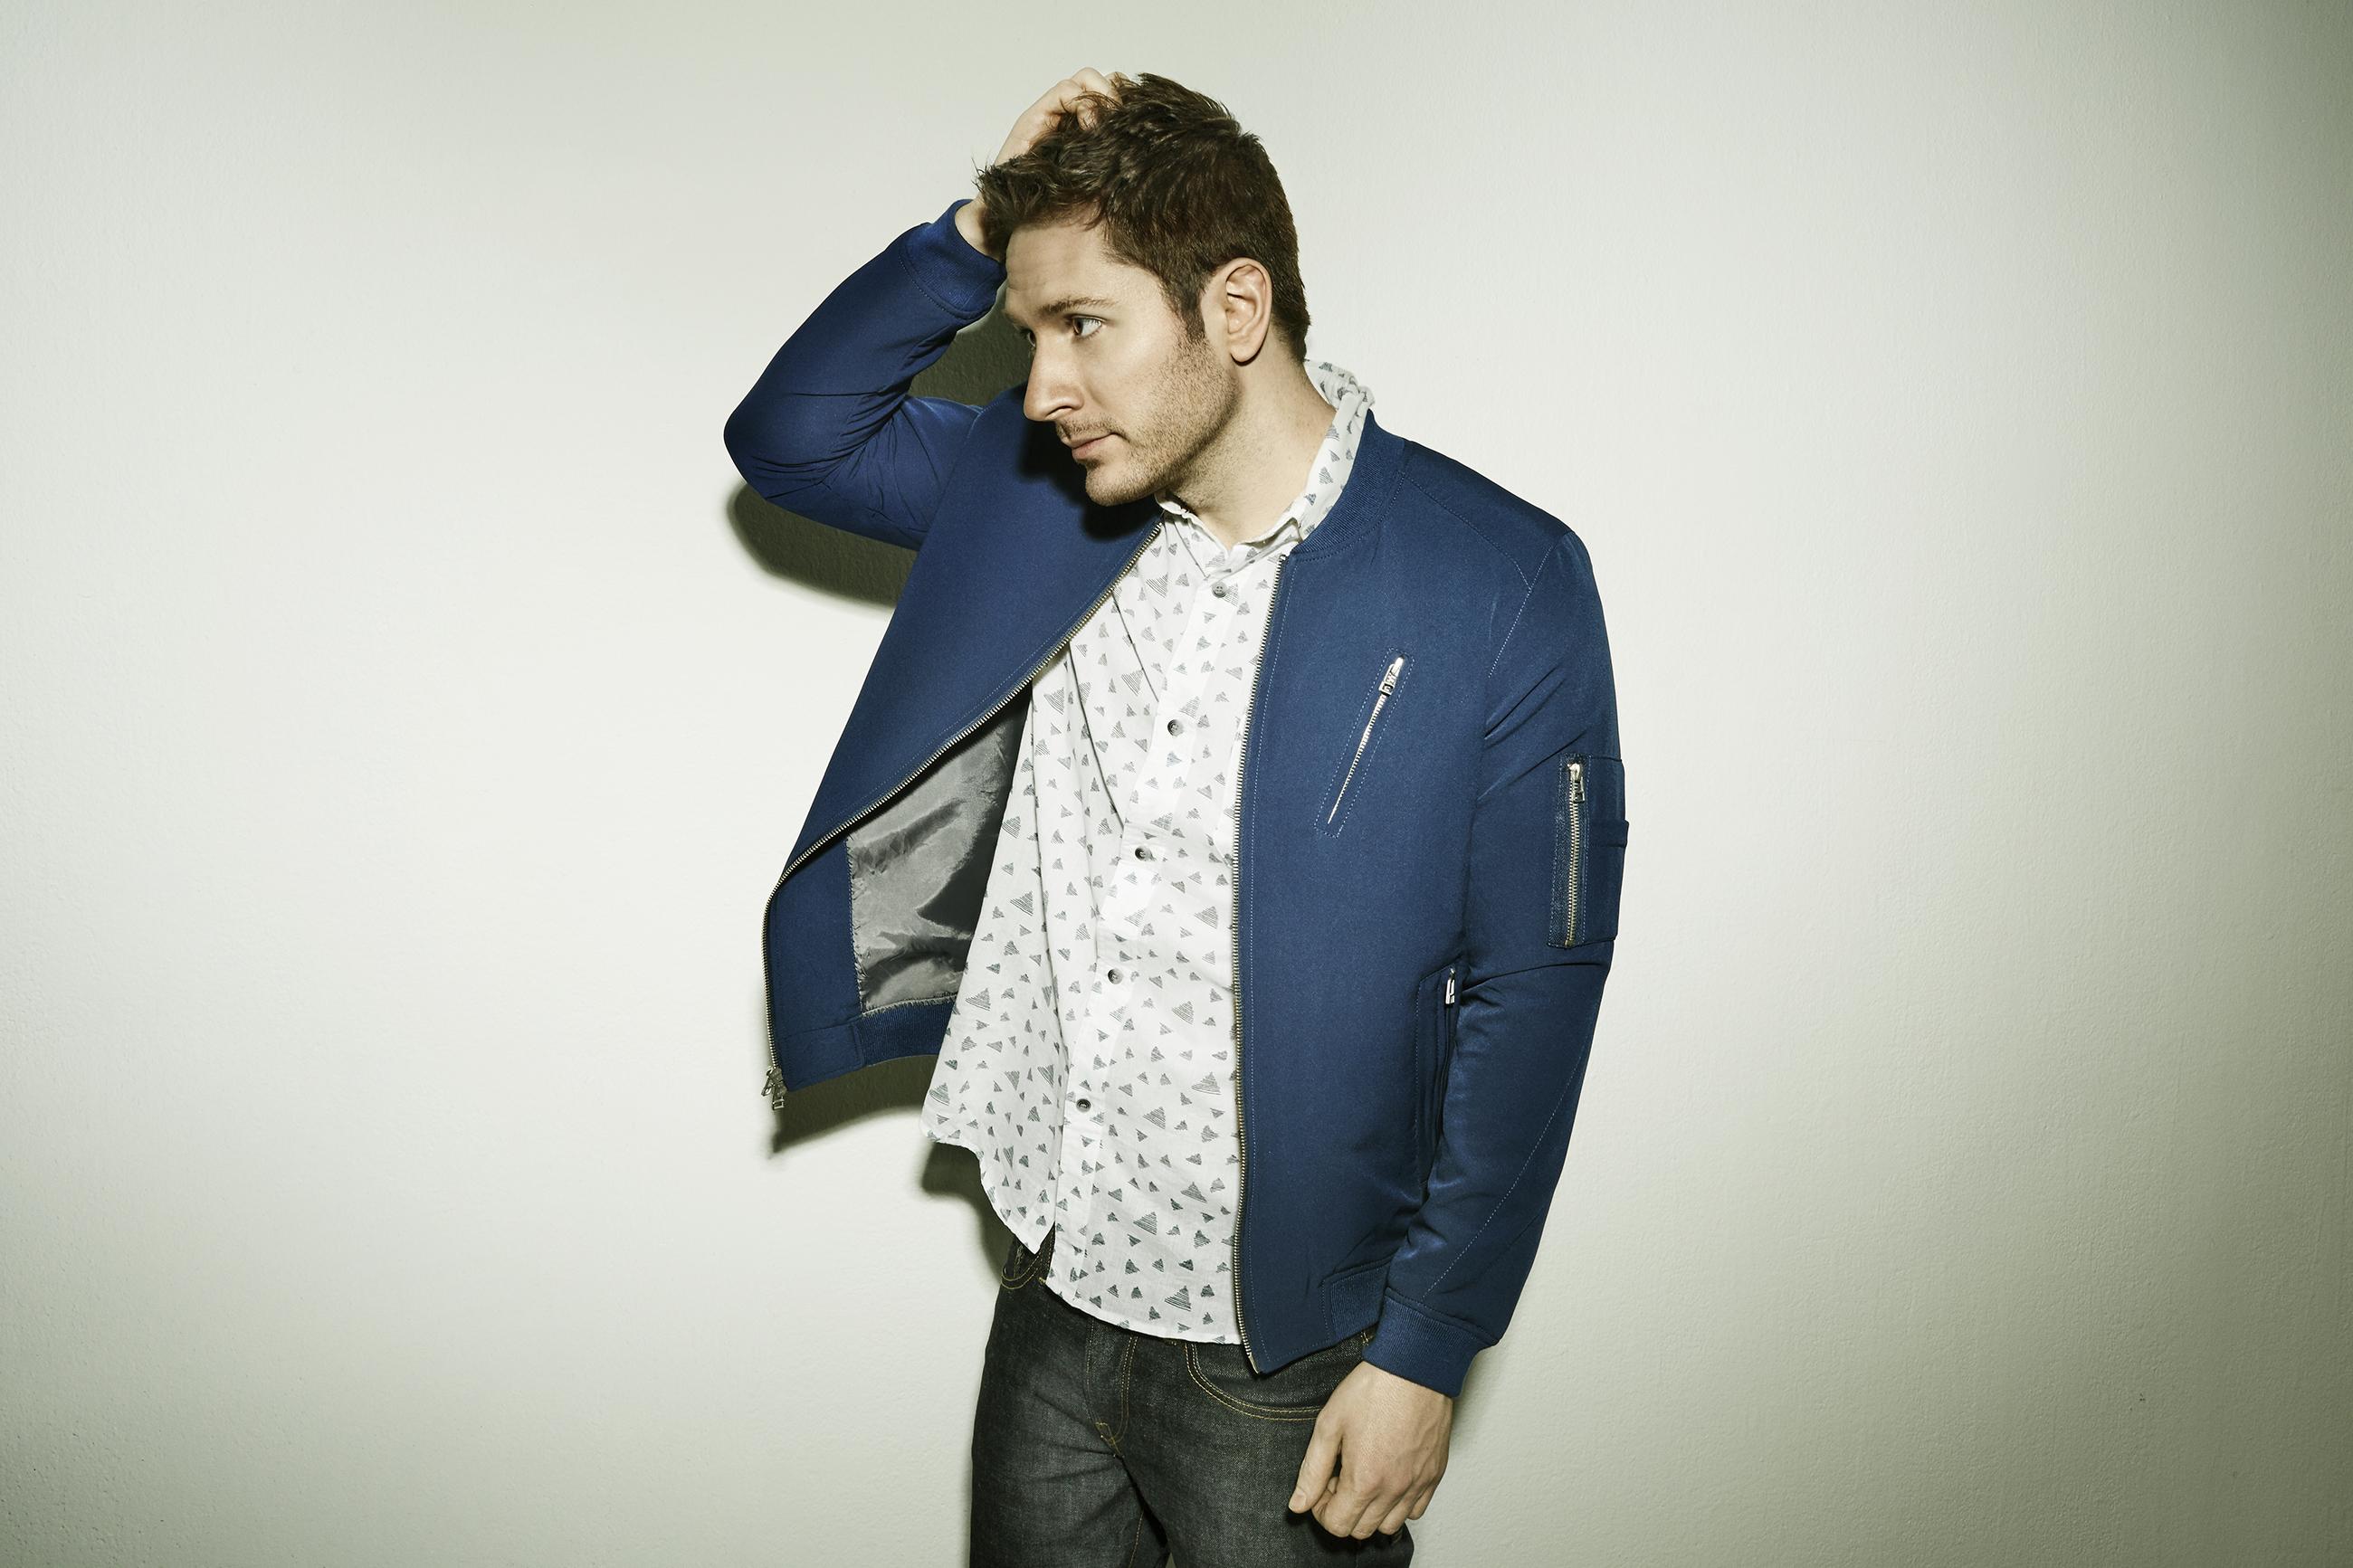 Adam Young - IMDb